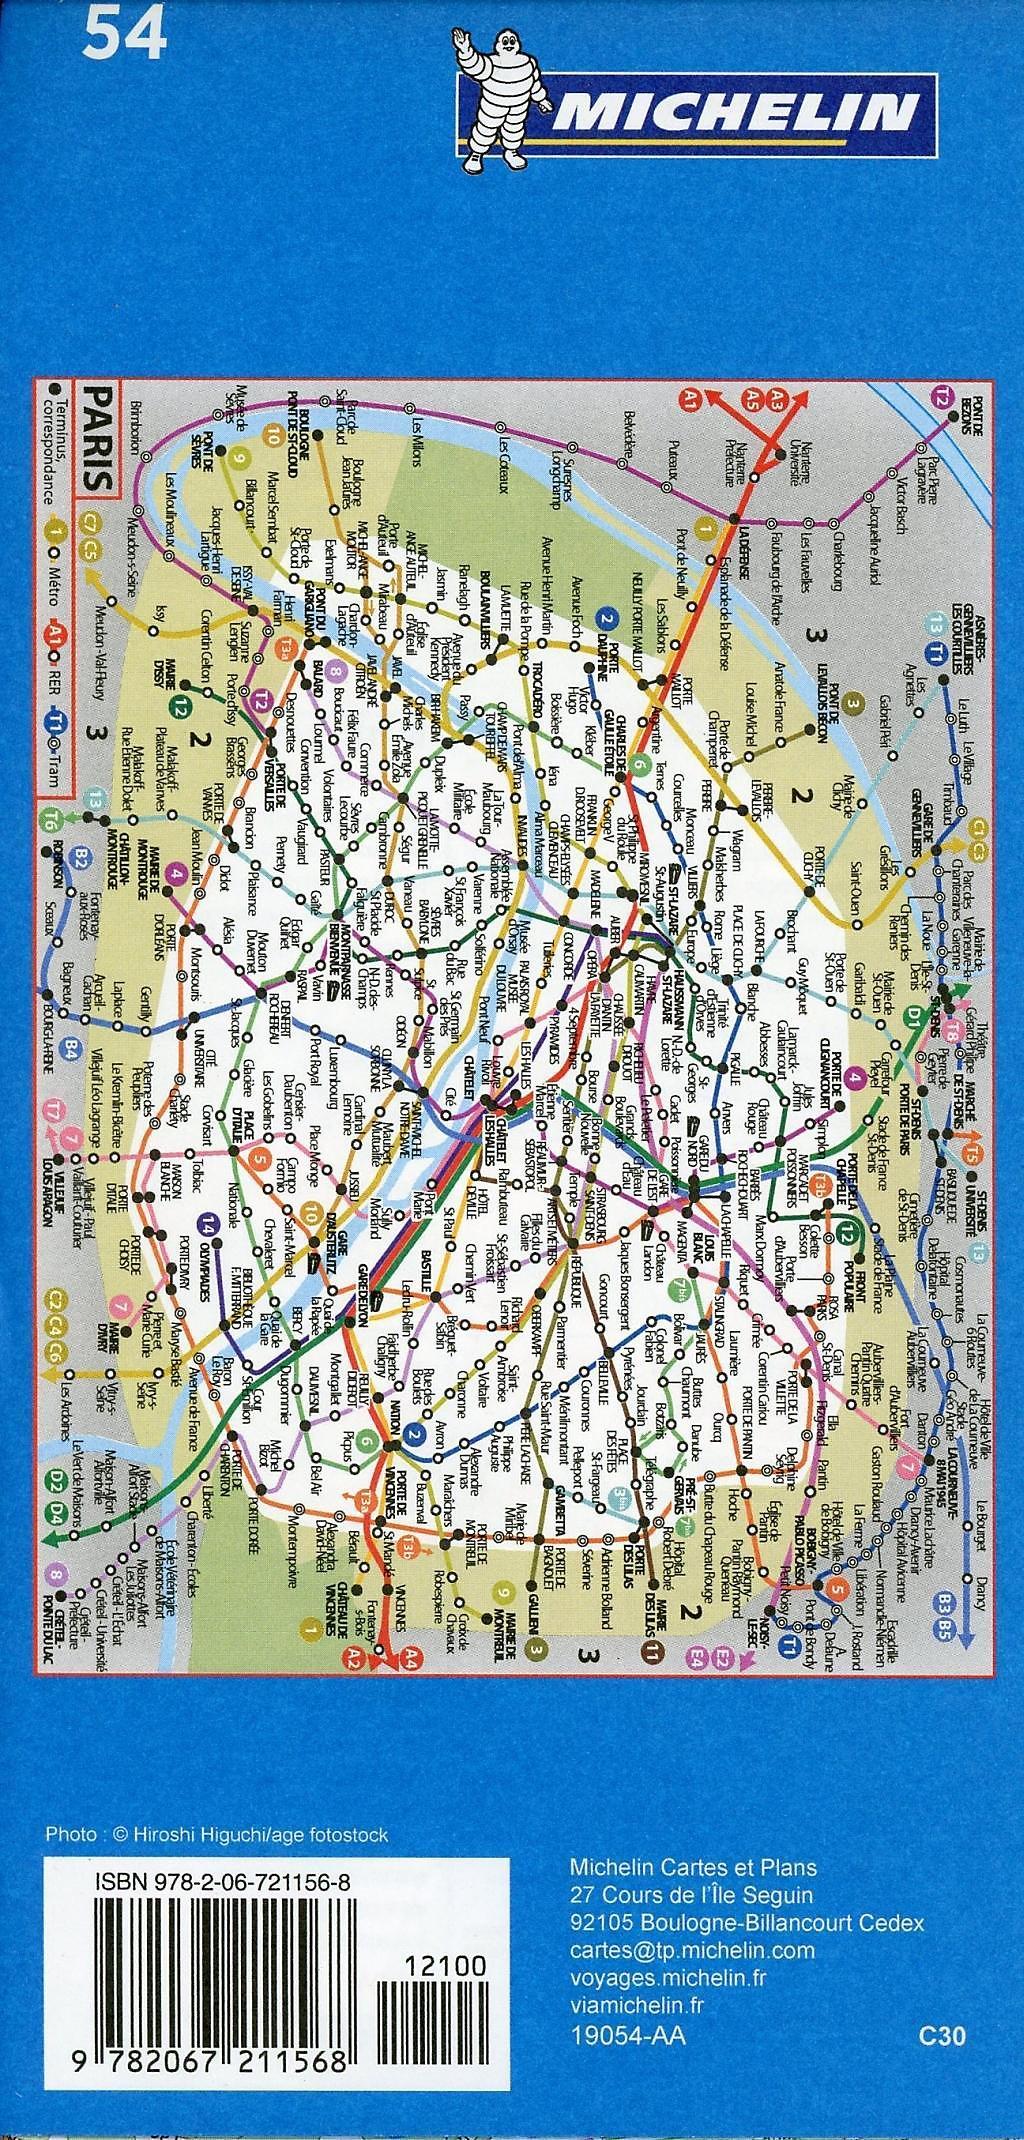 Karte Paris Stadtplan.Michelin Karte Stadtplan Paris Buch Bei Weltbild Ch Bestellen